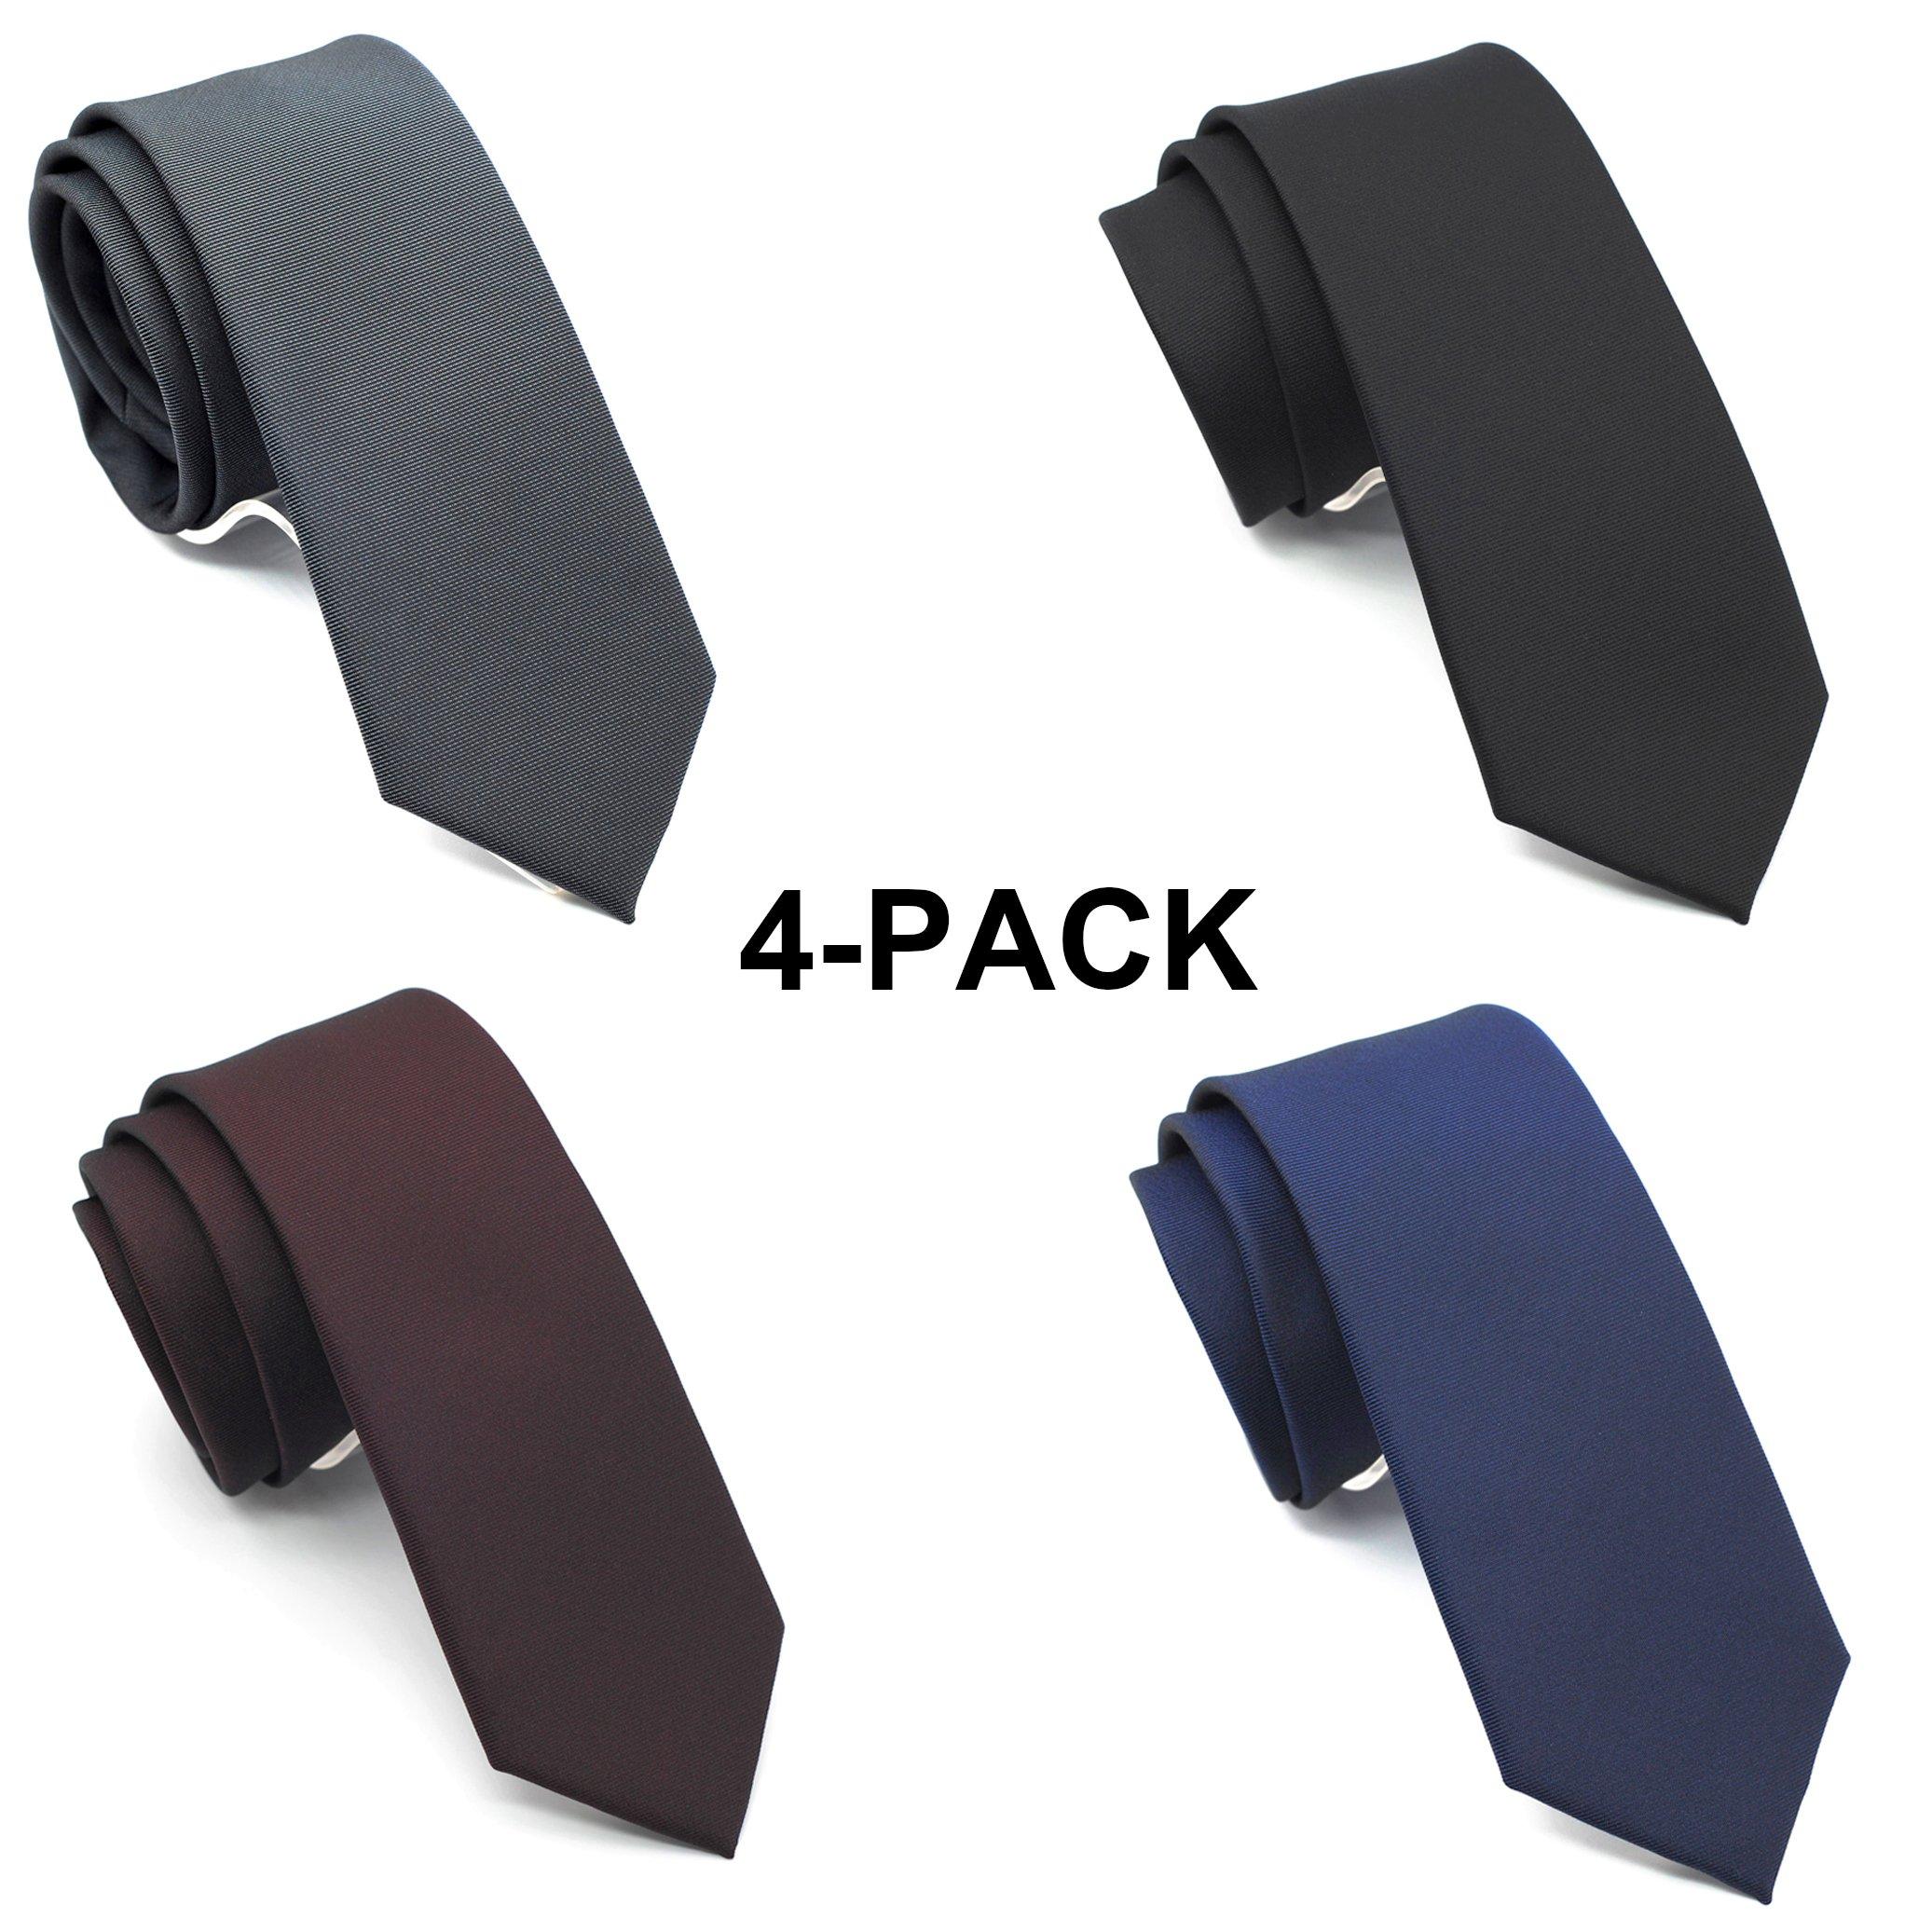 Skinny Neckties Solid Matte Color Slim Neck Tie 2(1/2)'' 4-Colors TC040E,Narrow,(4 Pack)